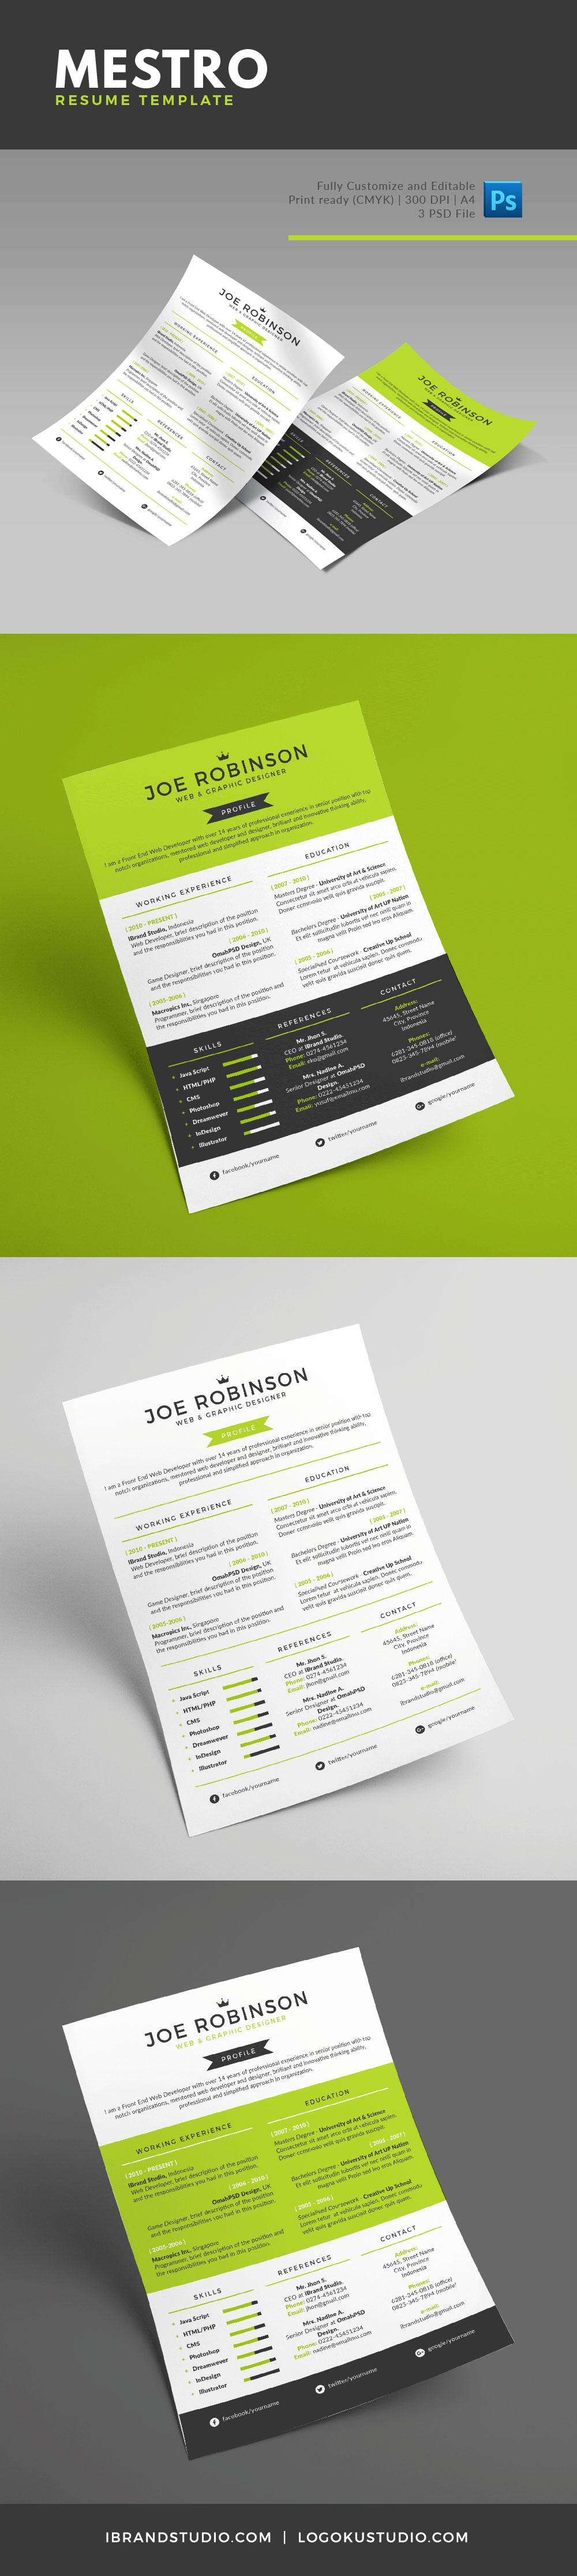 Free Mestro Resume Template - 3 Custom Colors